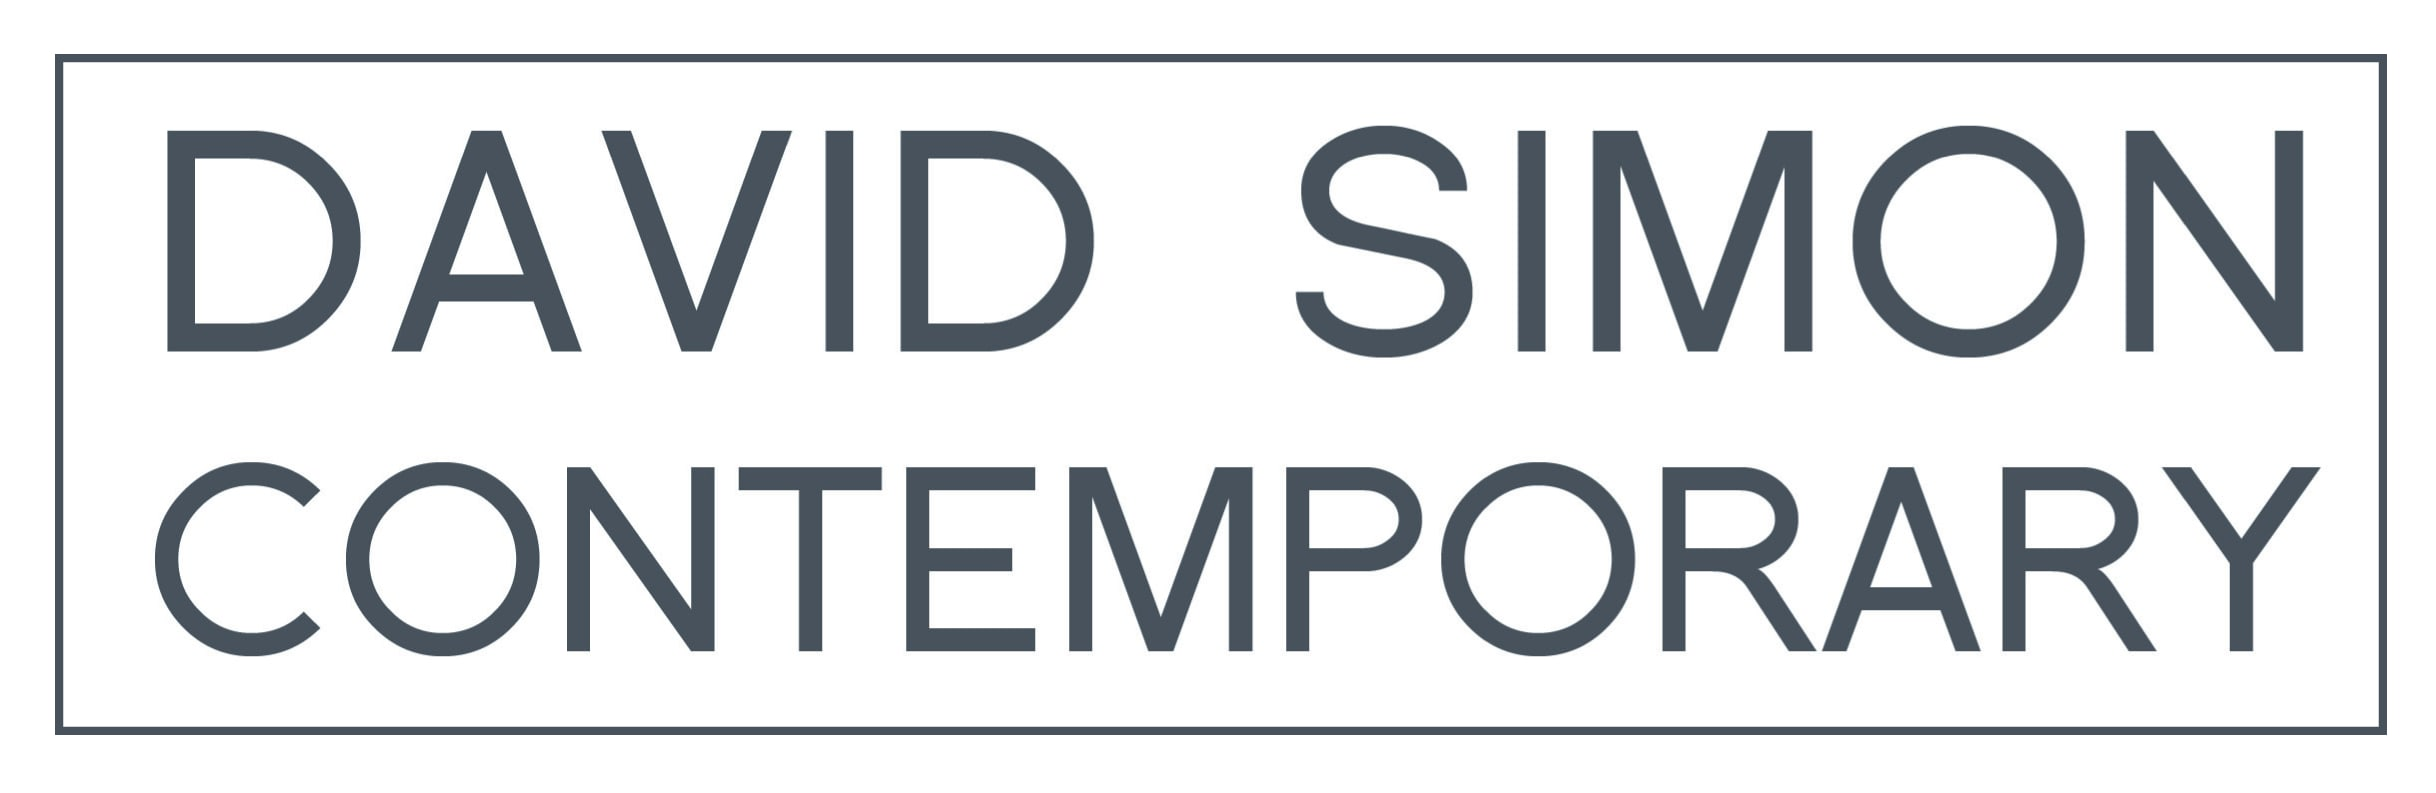 David Simon Contemporary company logo